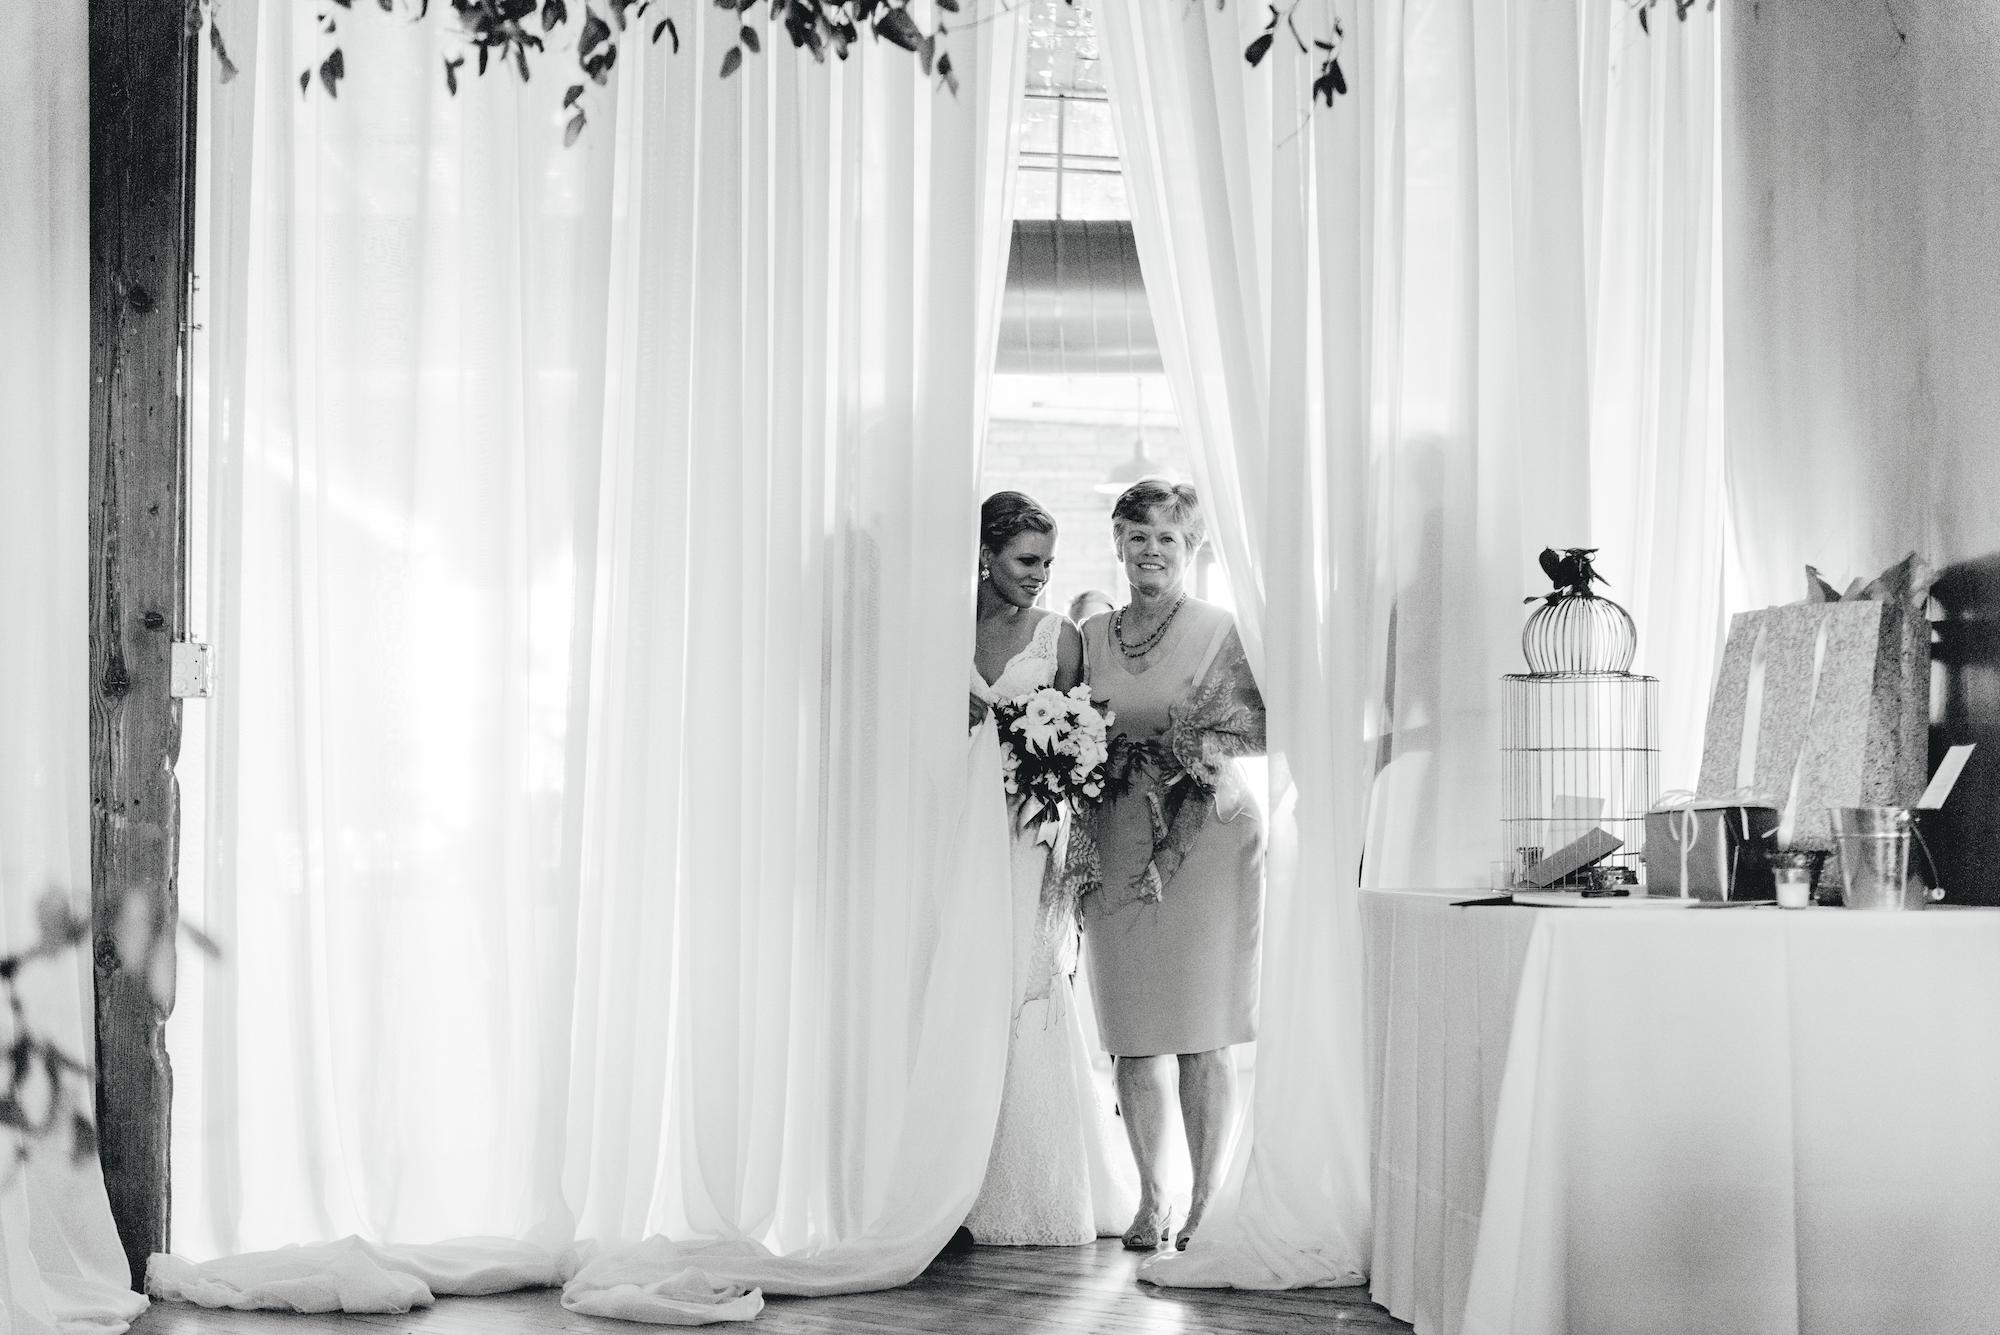 Roy_Son_Photo_Acowsay_Cinema_MN_Wedding_22.jpg